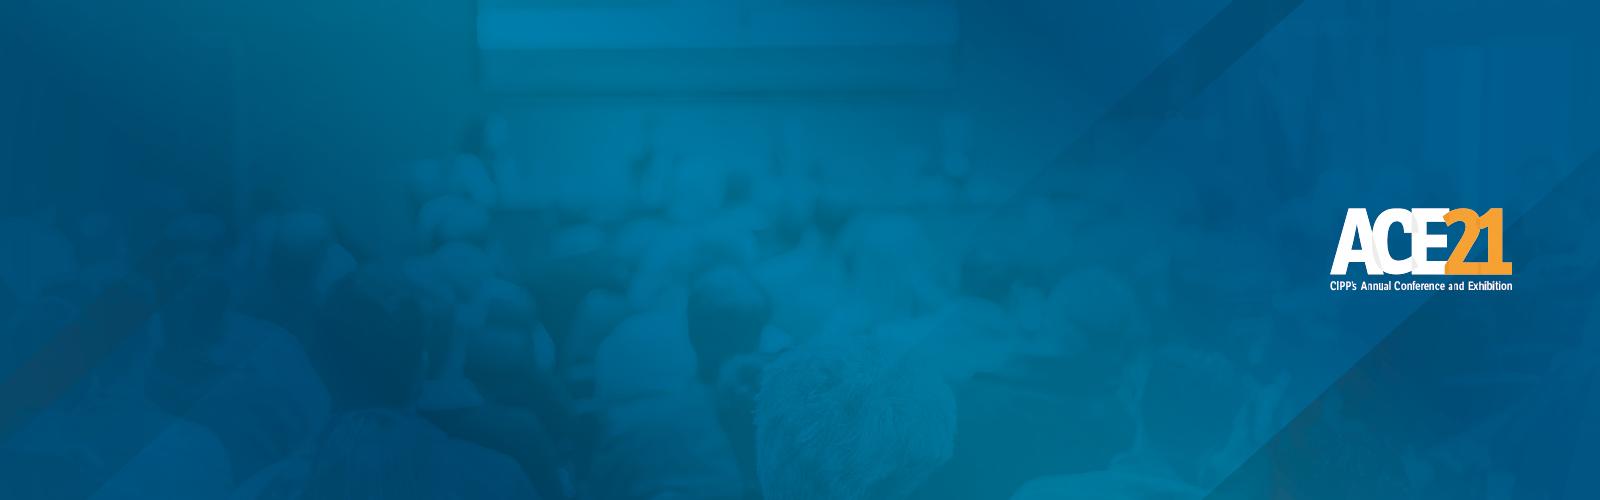 ACE21 website event page header - July 2021n.jpg